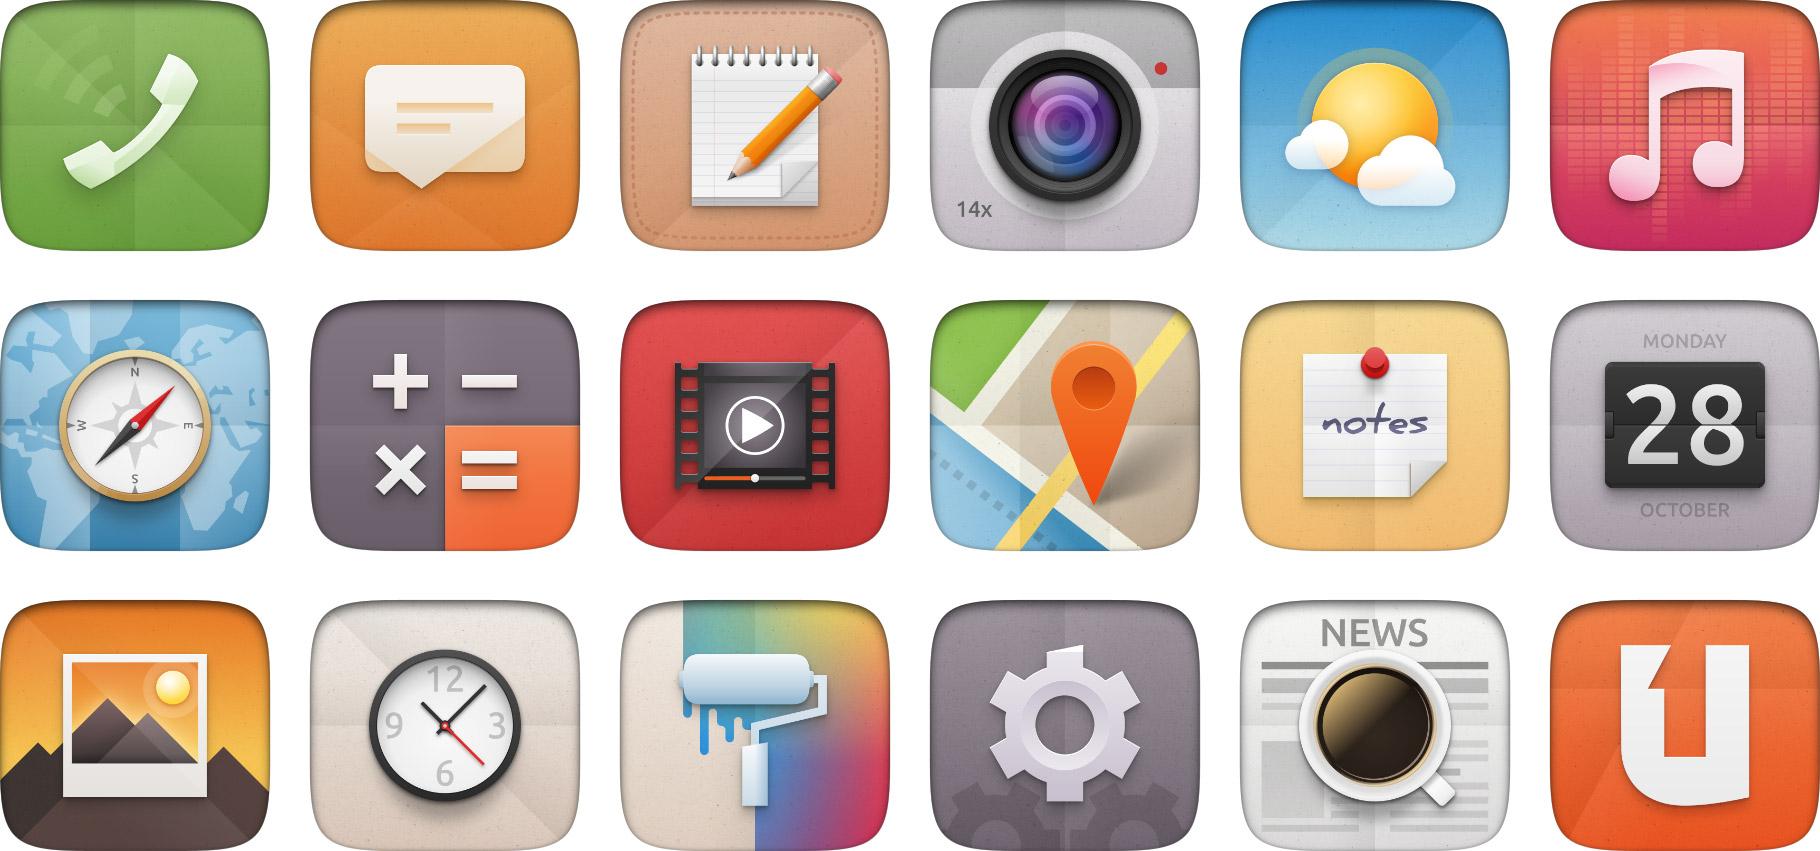 Ubuntu Application's Icon